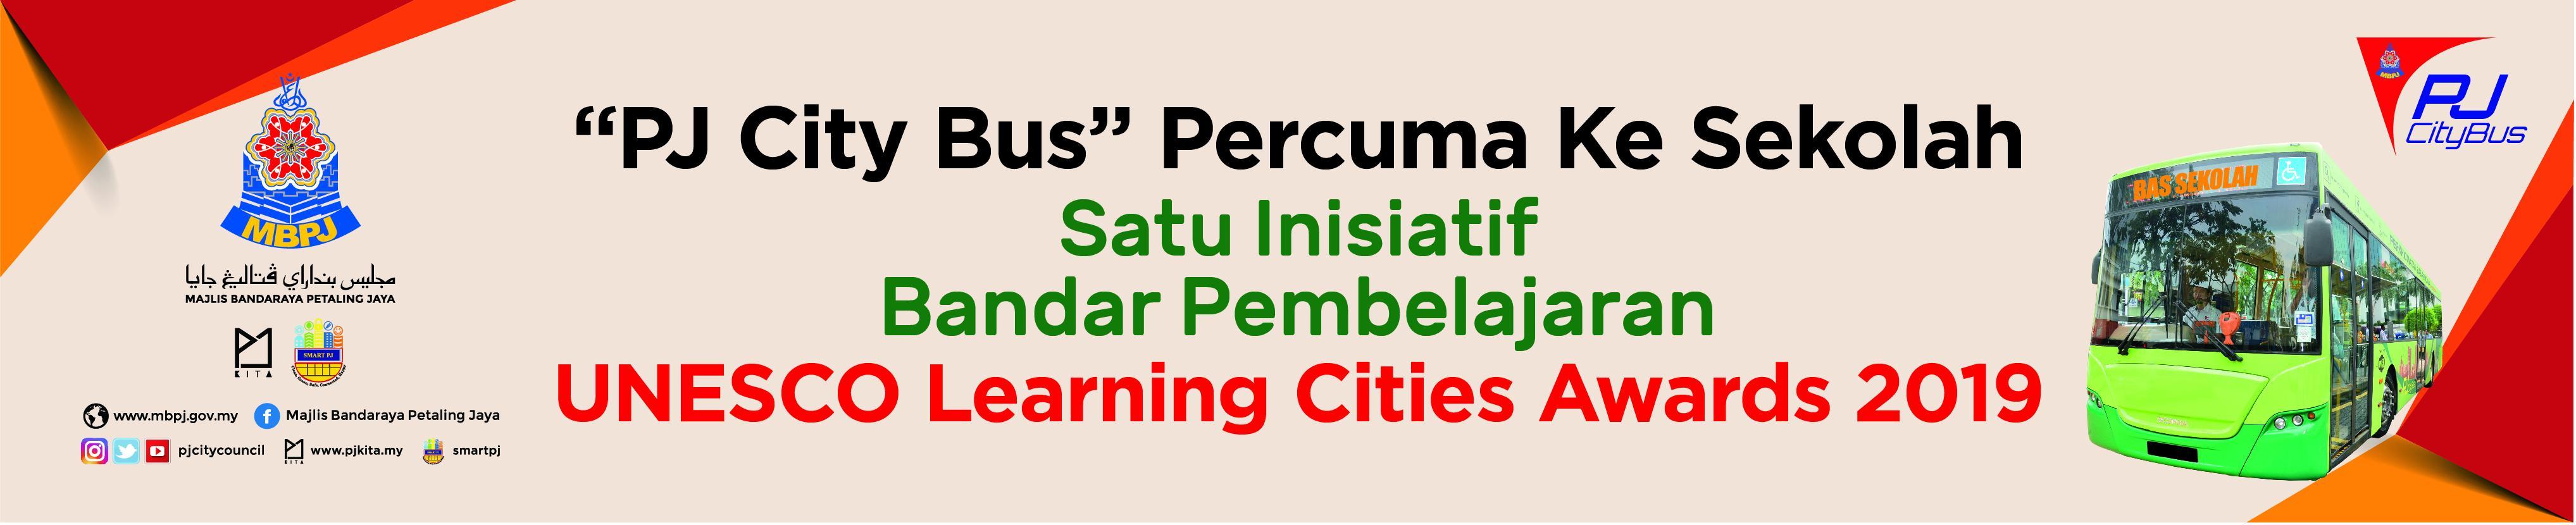 Official Portal of Petaling Jaya City Council (MBPJ) |